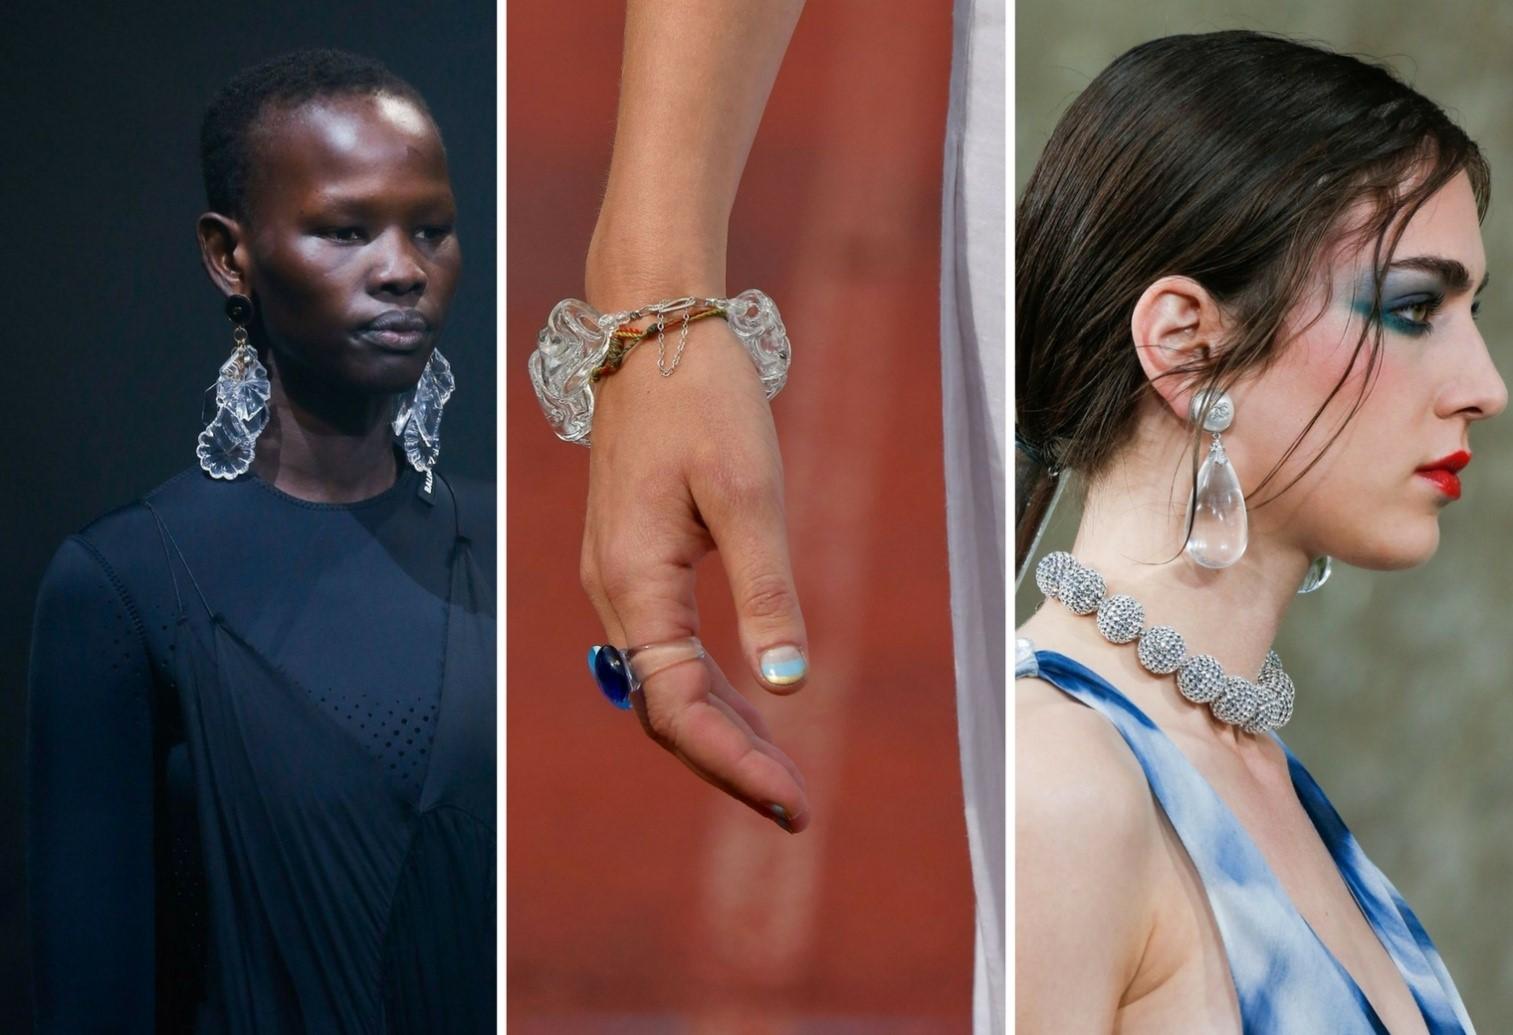 Transparent Jewellery jewellery trends for 2018 - Transparent Jewellery - Jewellery trends for 2018 – Bangalore